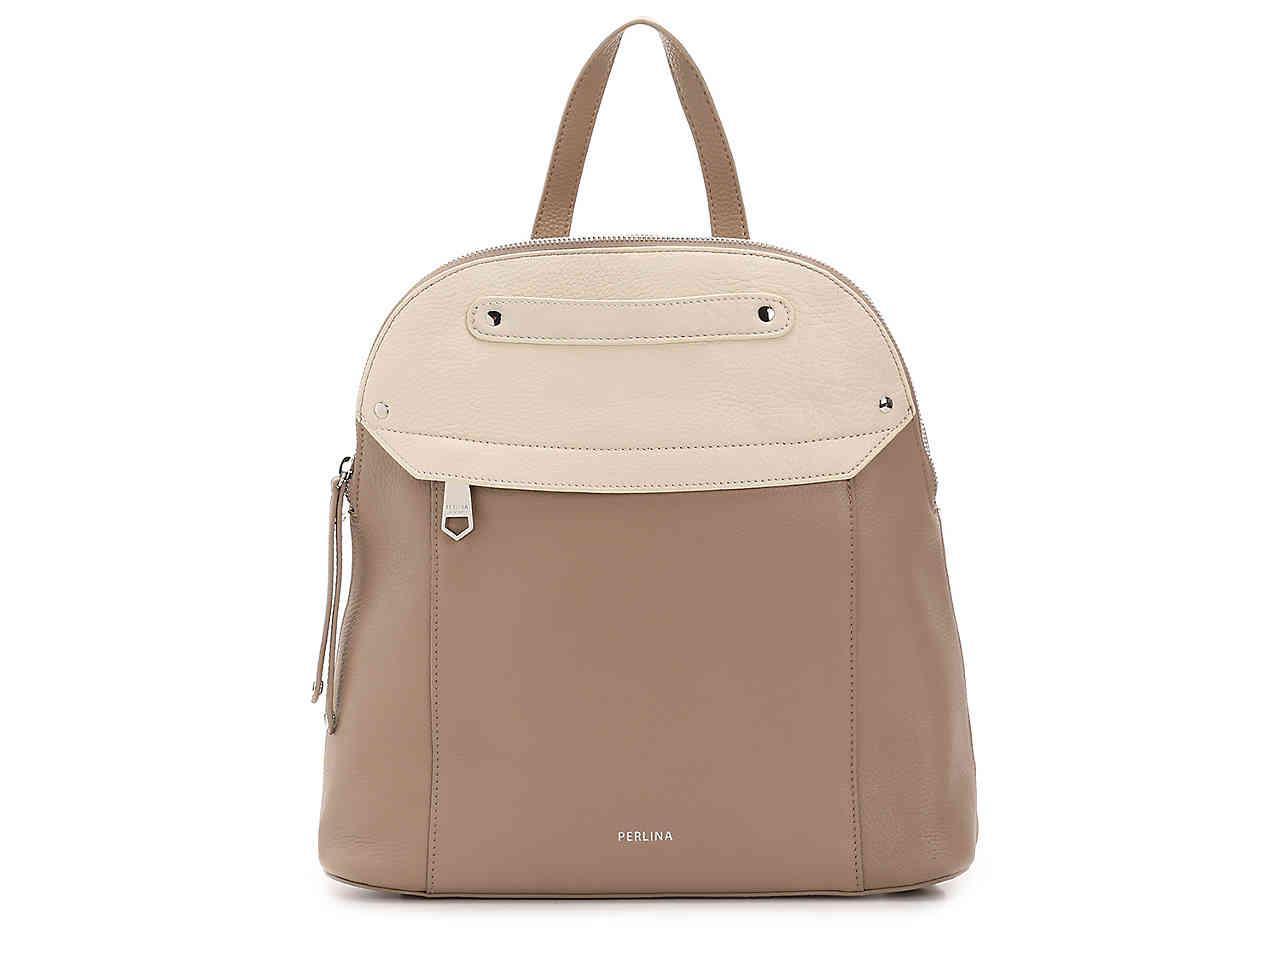 9ba2c13cd524 Perlina Backpack Purse - Best Purse Image Ccdbb.Org